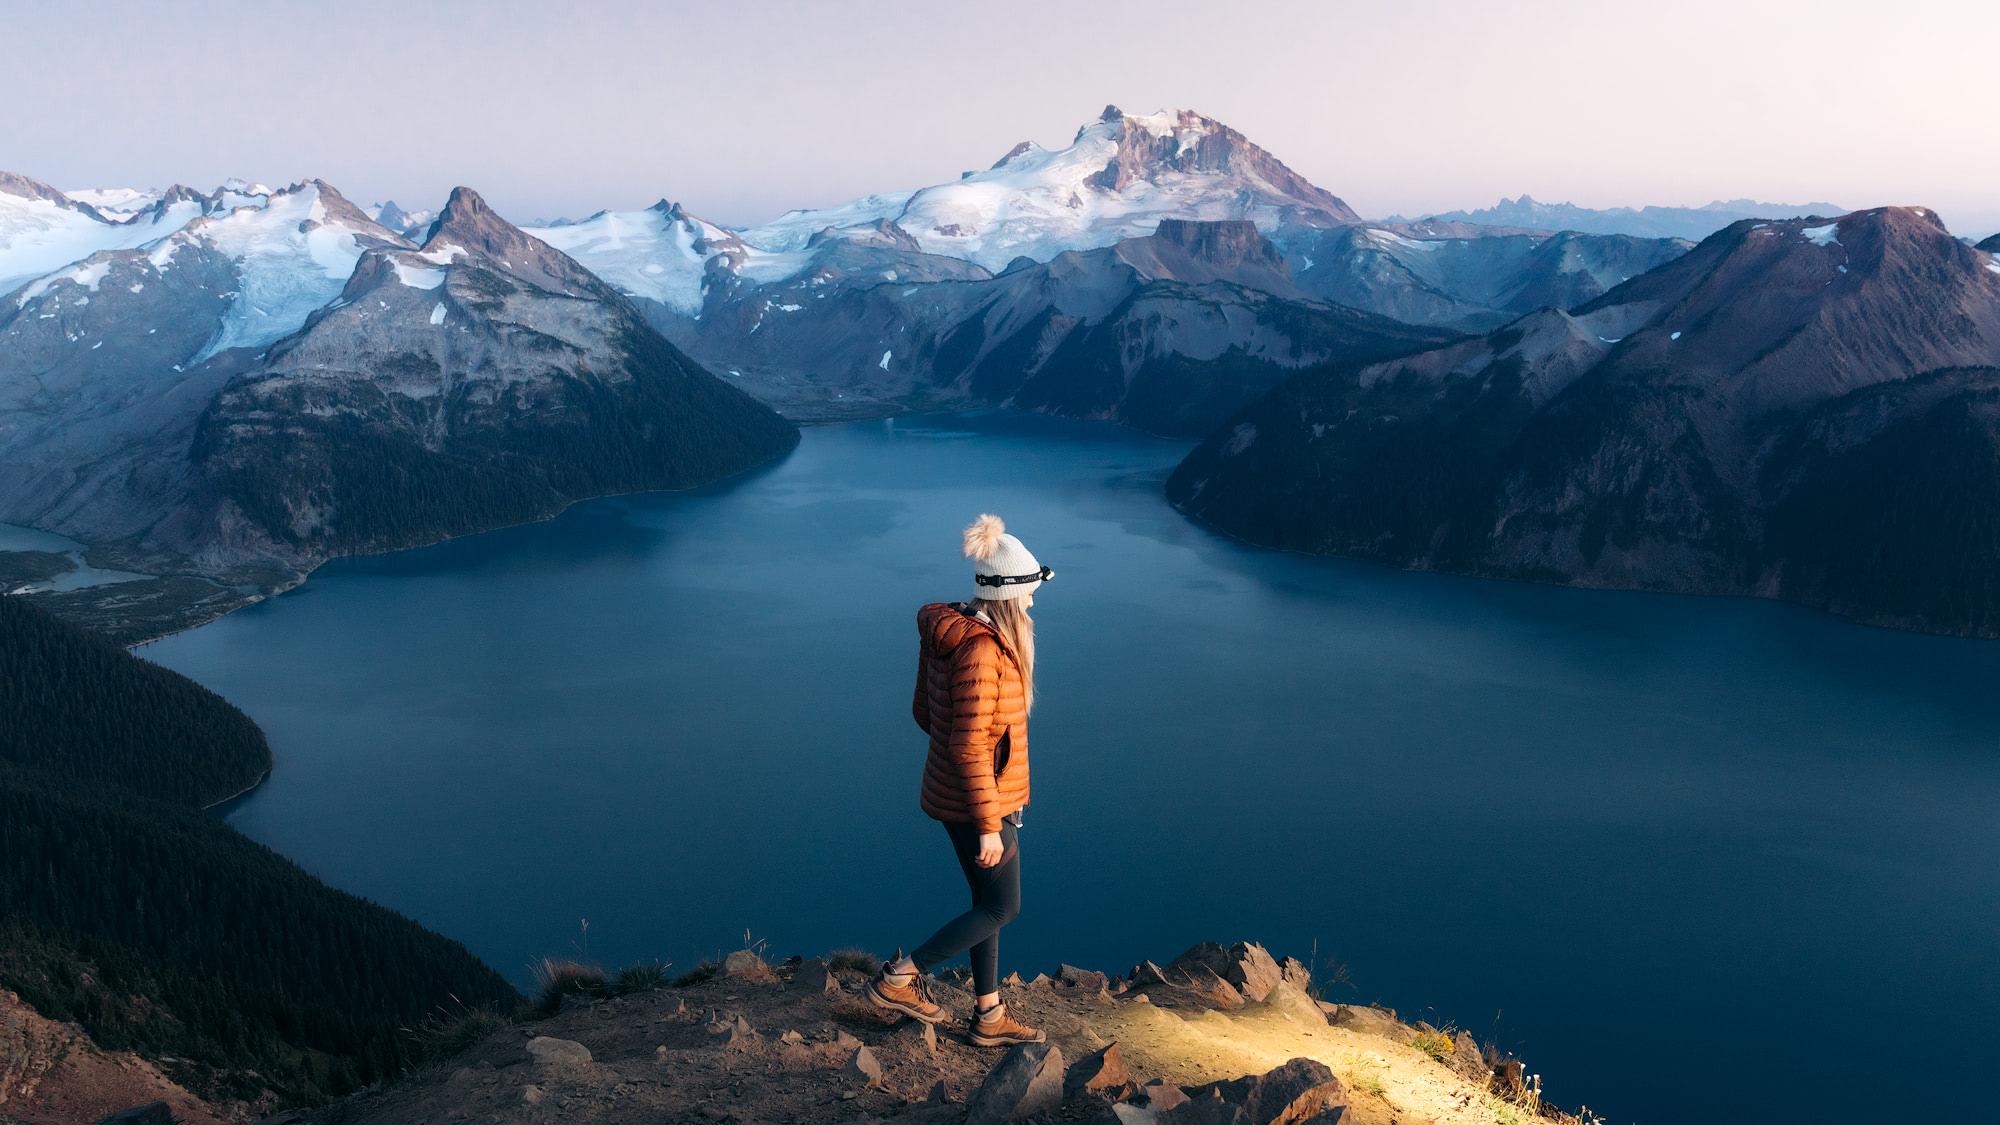 Renee Roaming Travel Adventure Hiking Photography Blog